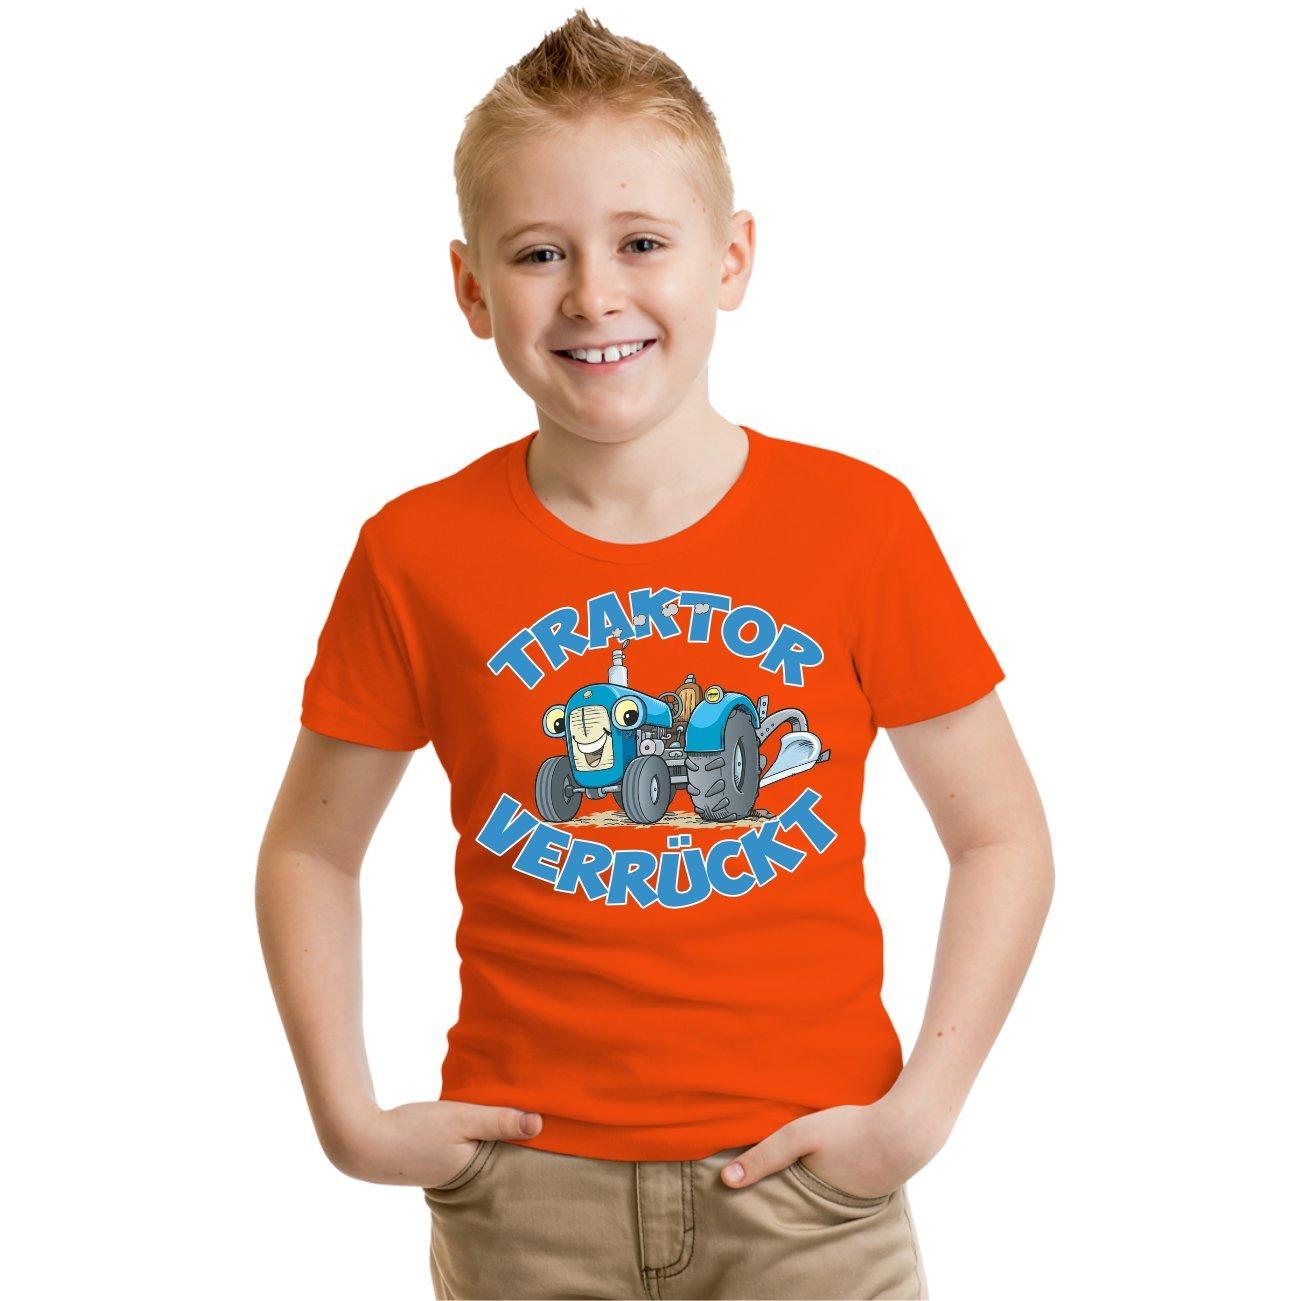 Spaß kostet Kinder T-Shirt Traktor verrückt Größe 86-164: Amazon.de:  Bekleidung